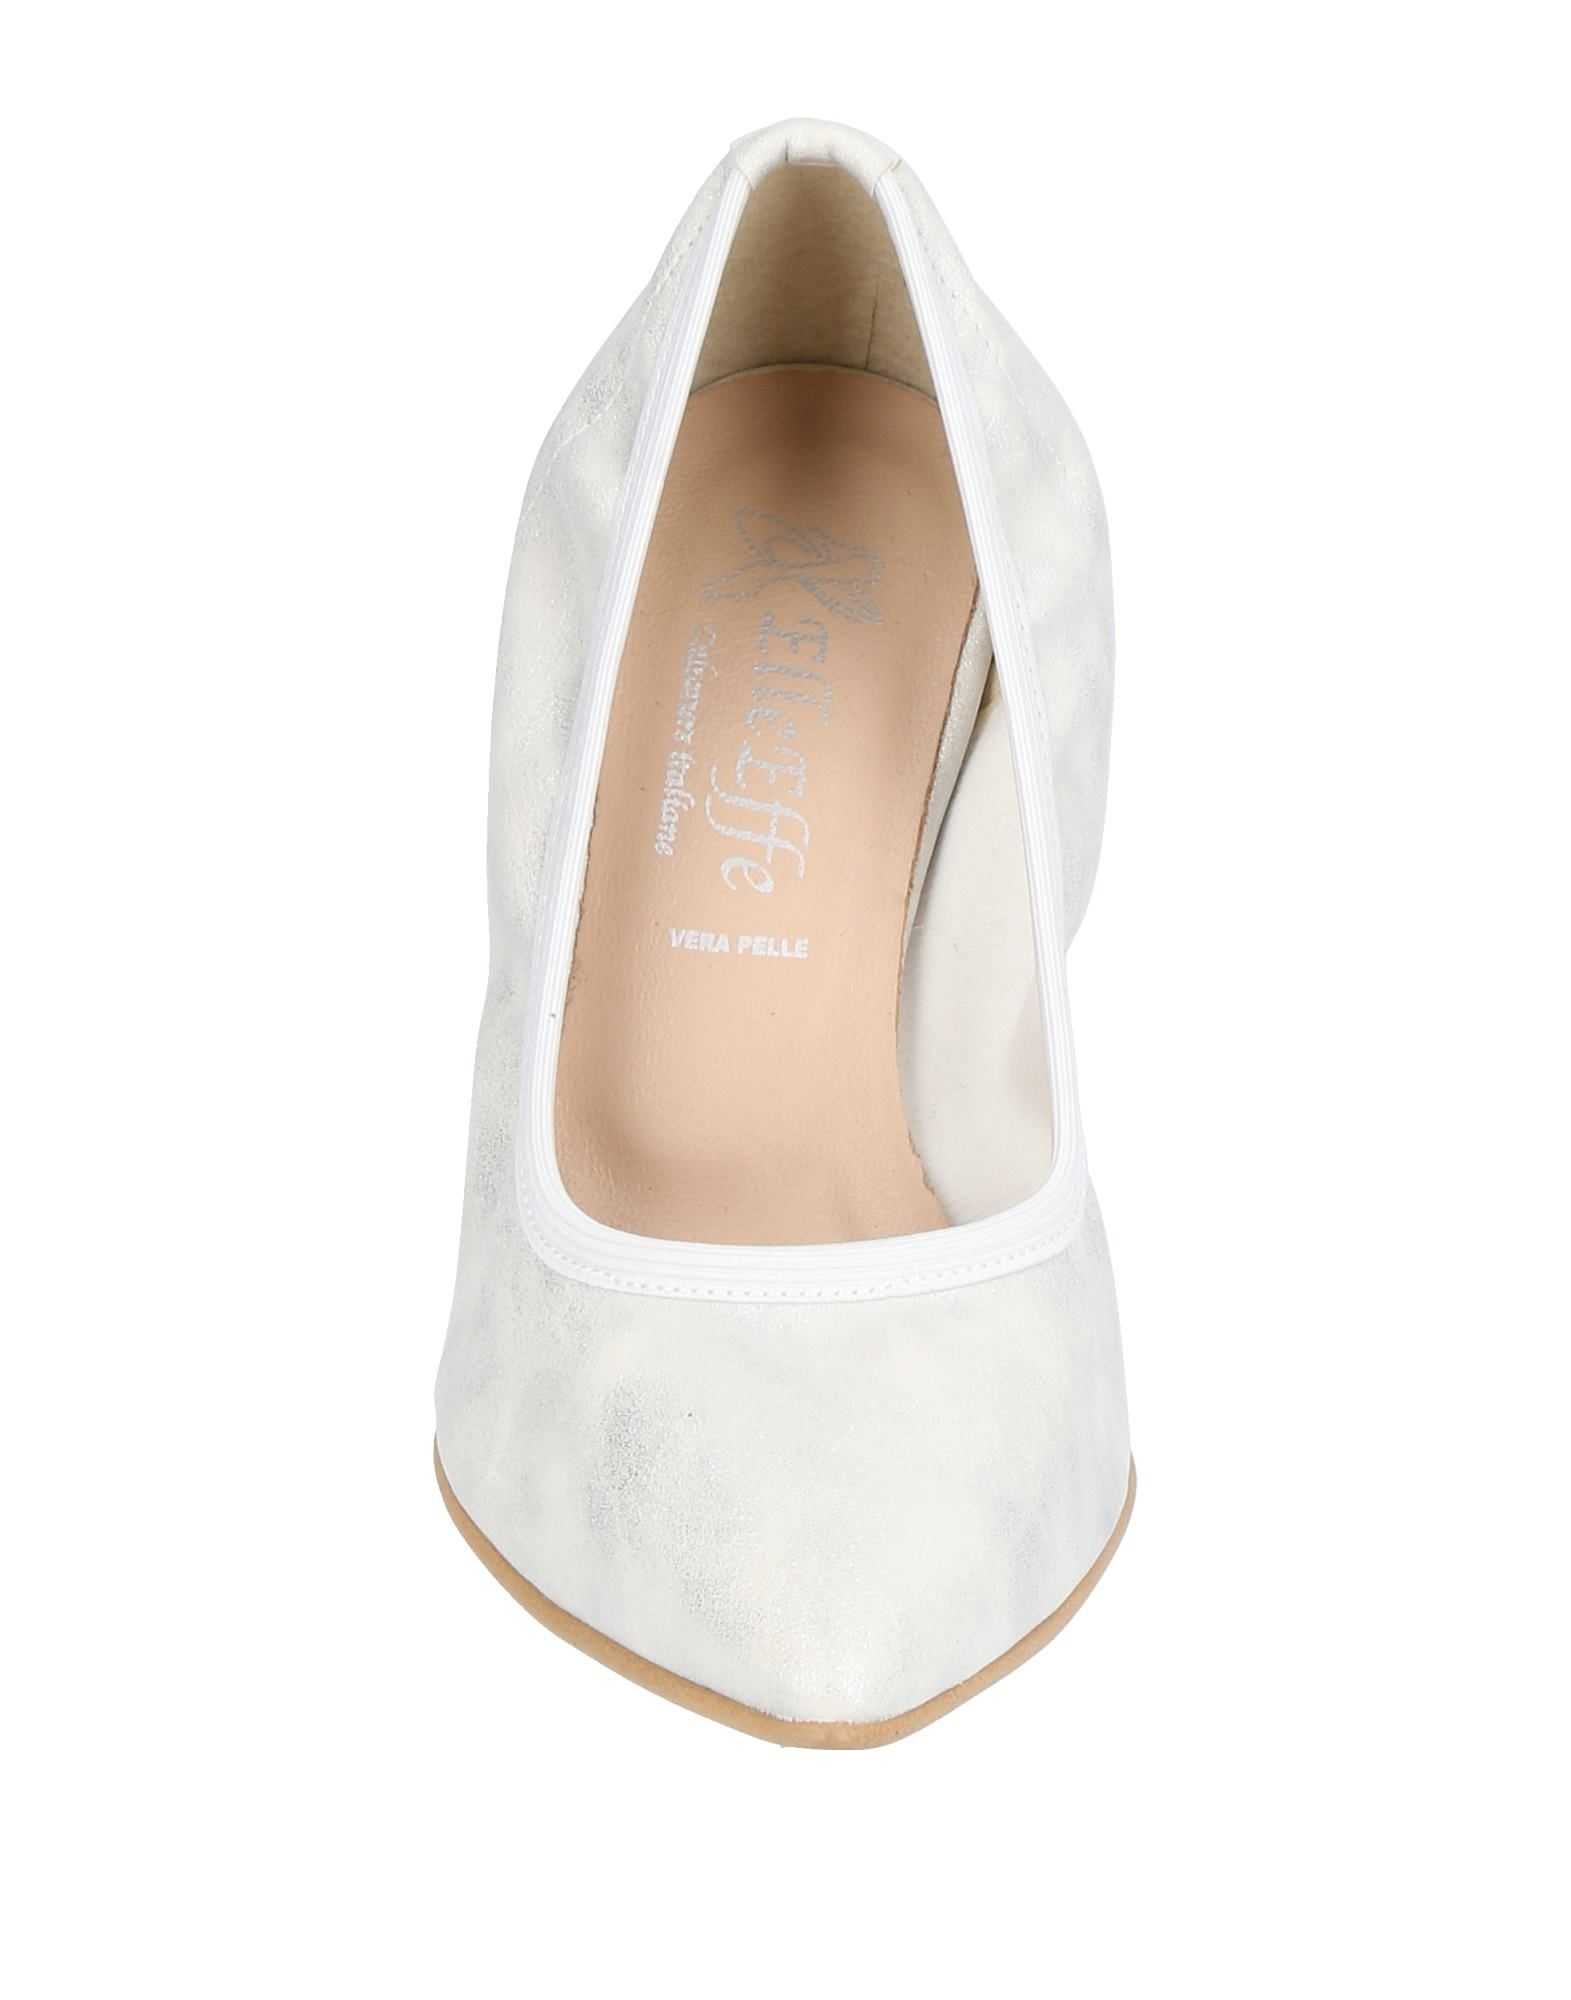 Elle Damen Effe Pumps Damen Elle  11466061IG Gute Qualität beliebte Schuhe f3f526